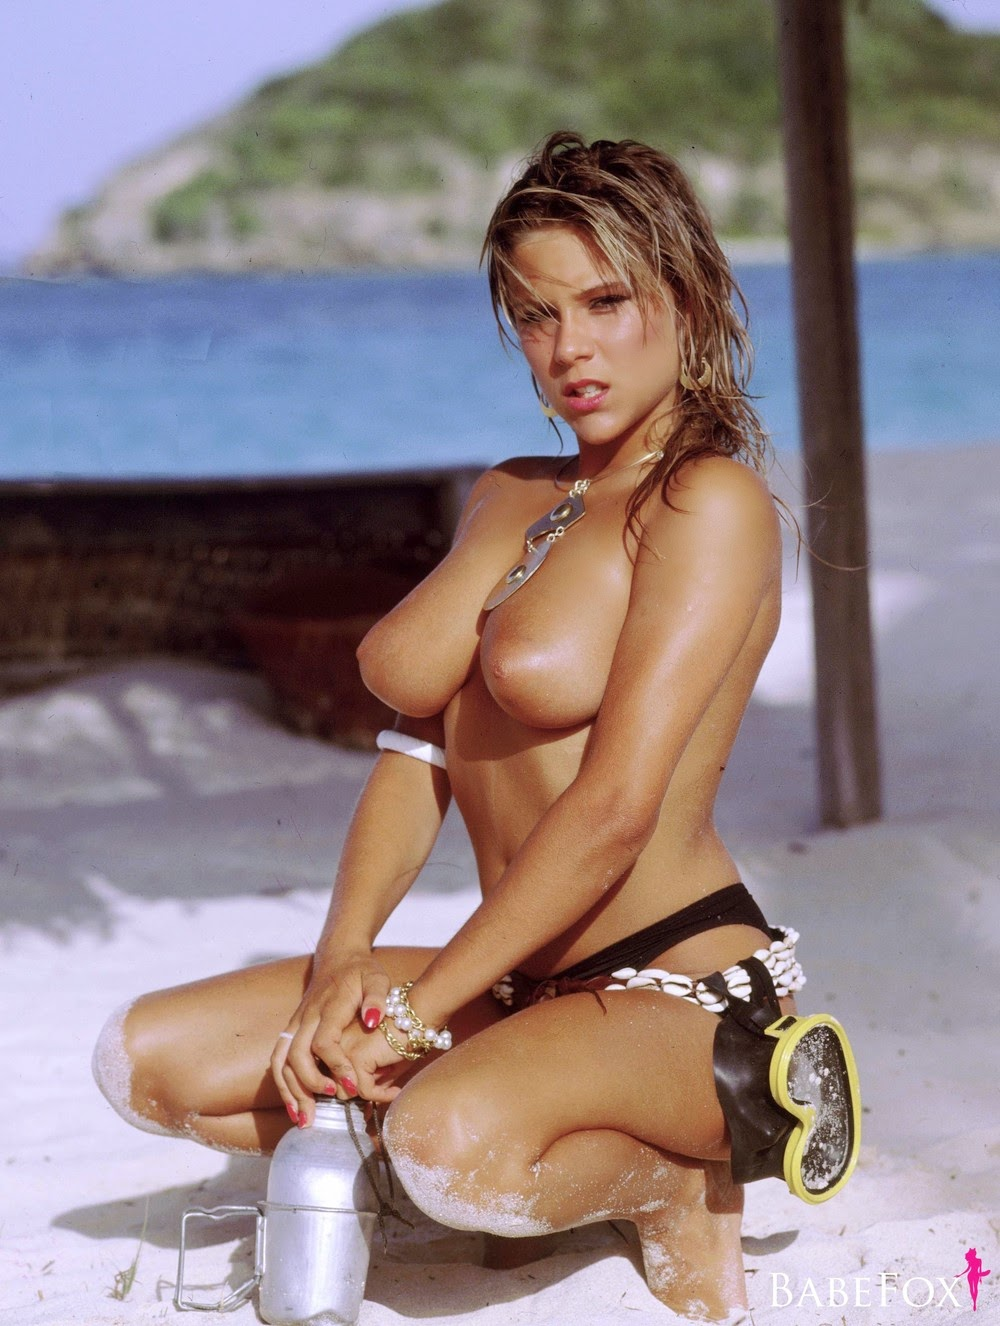 Саманта фокс порно фото 17 фотография